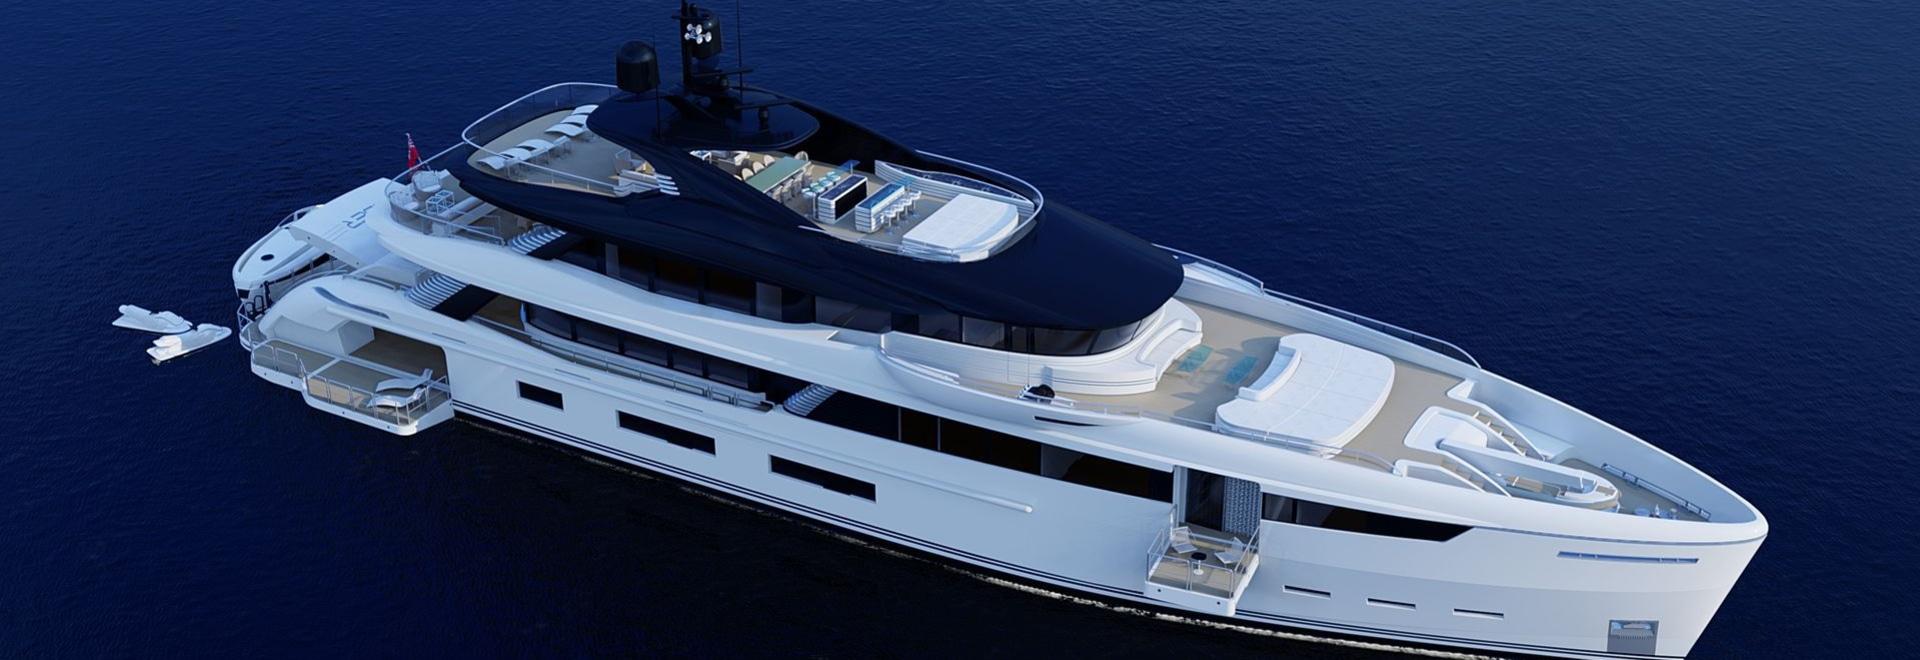 MYS 19: TAMABA Design Studio release 69m eco-superyacht concept: POSSIBLE